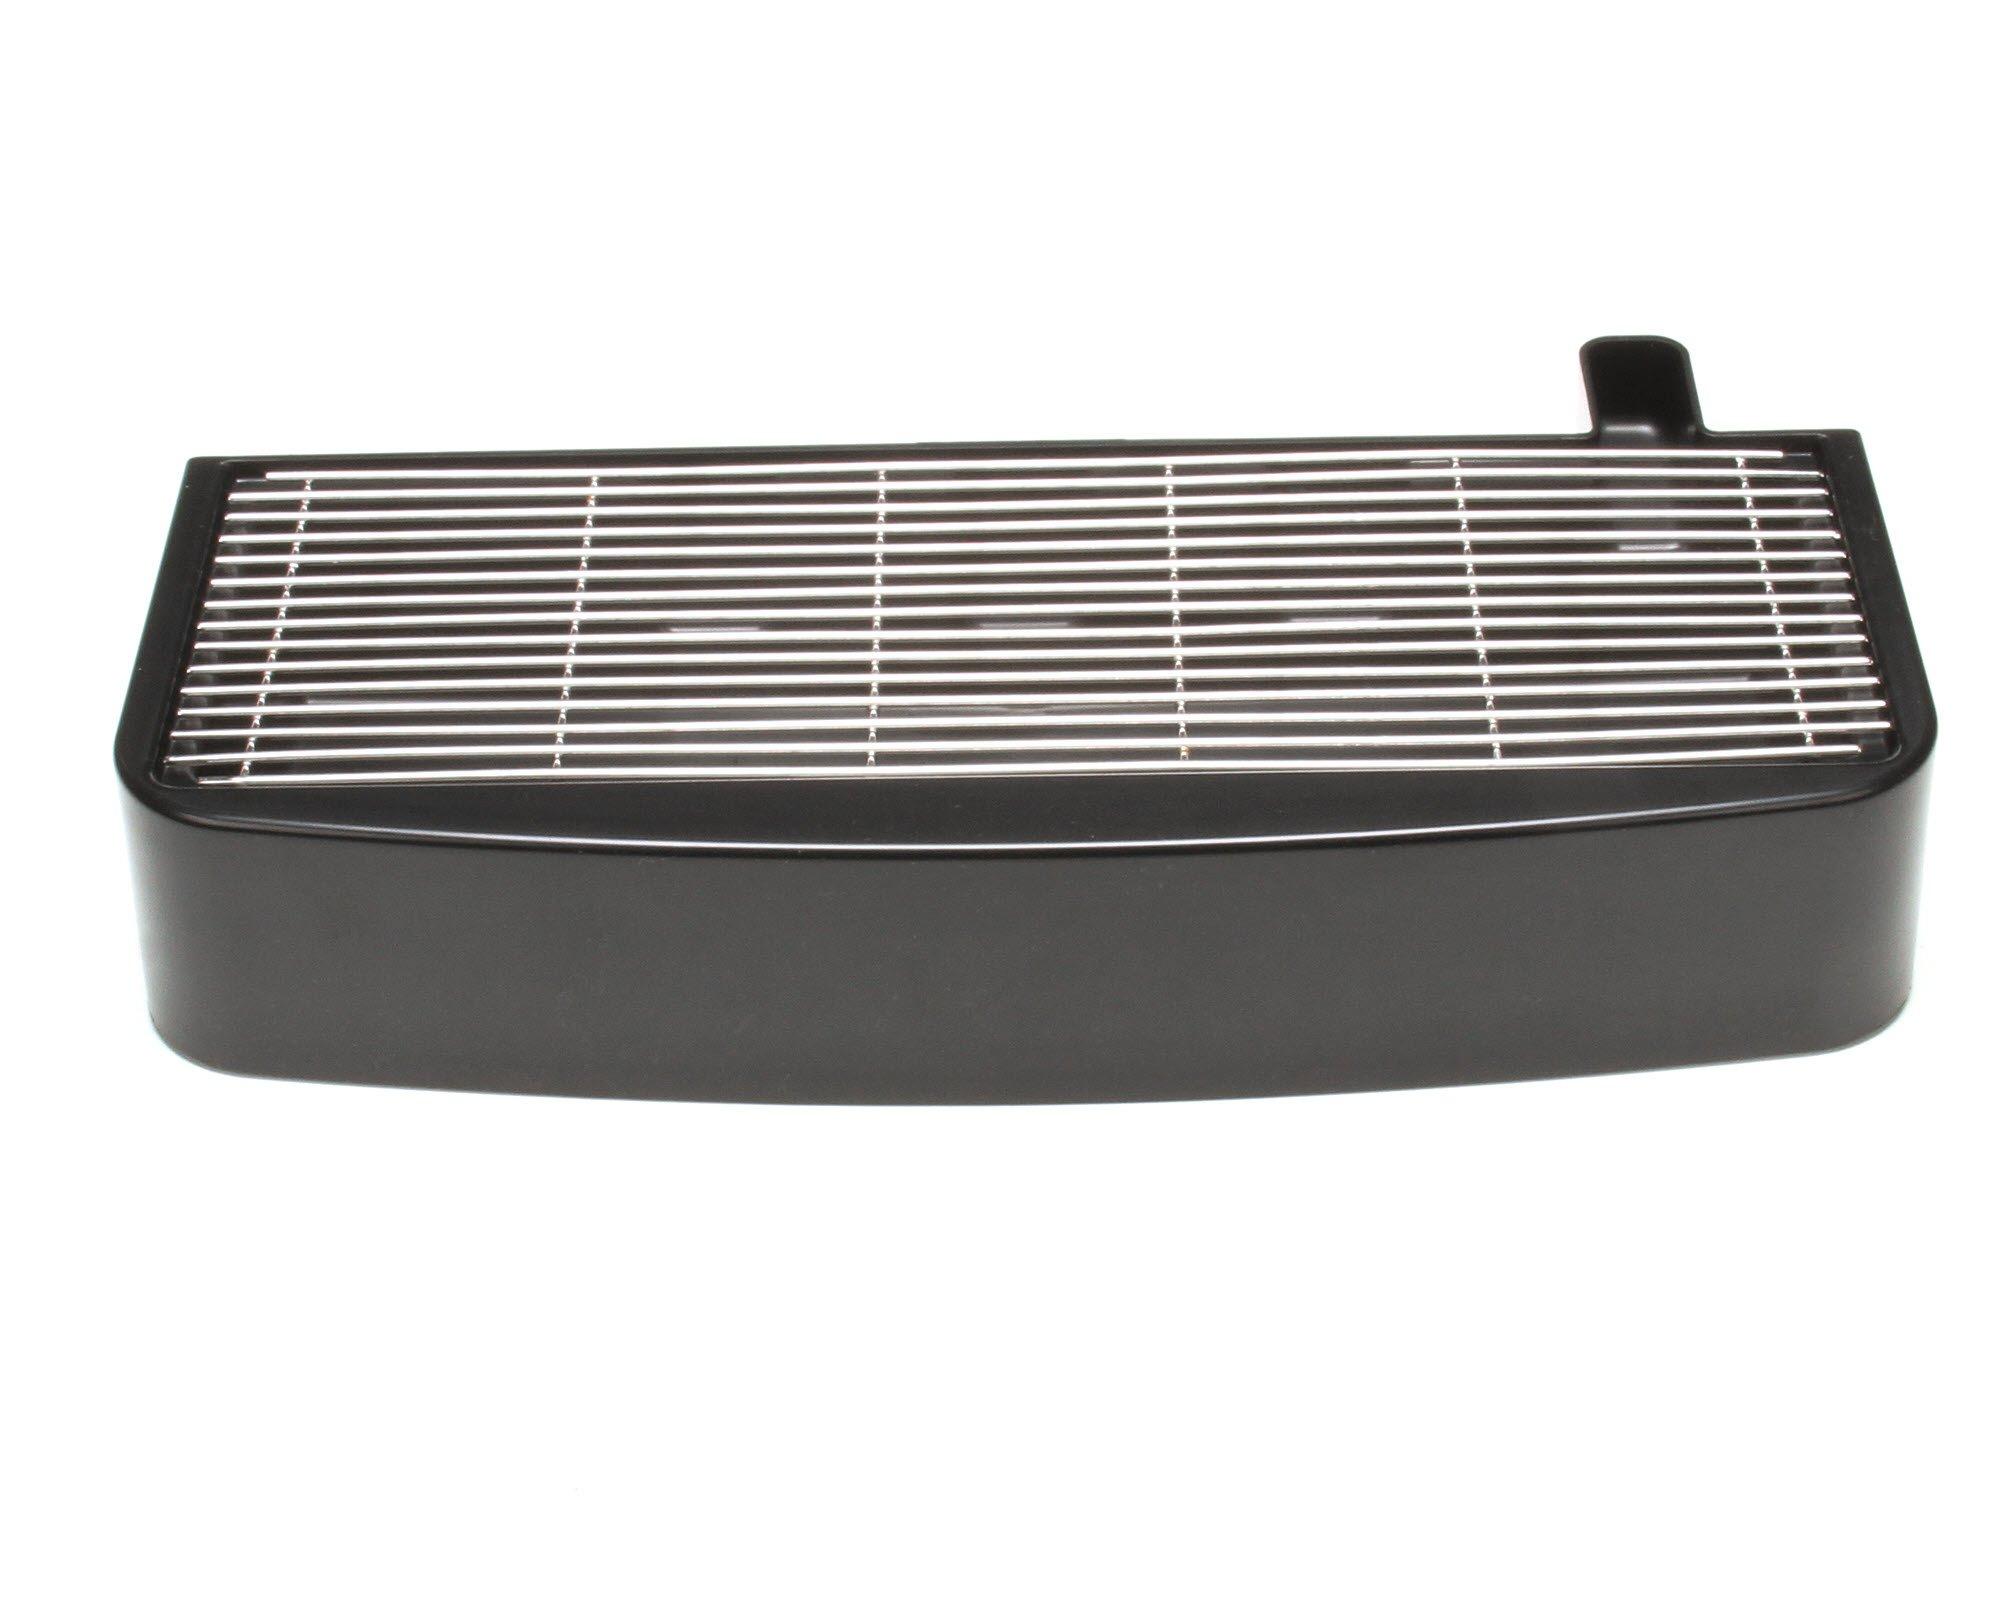 Bunn 38764.1001 Complete Jdf4S/Lcr3 Drip Tray